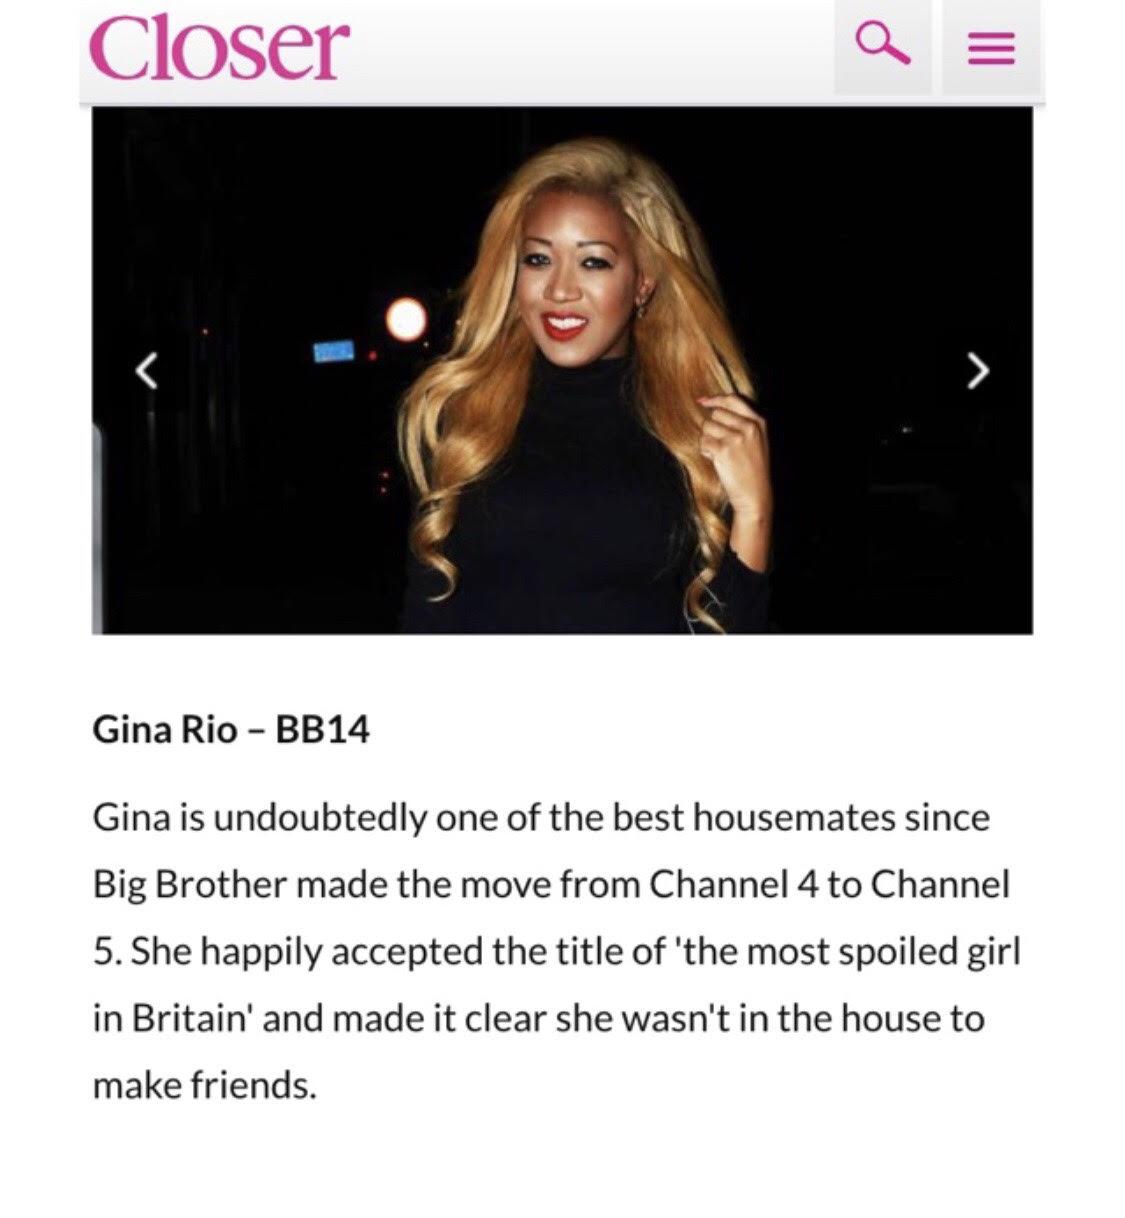 gina rio + georgina rio + hot + blogger + big brother + blonde + uk + closer magazine.jpg